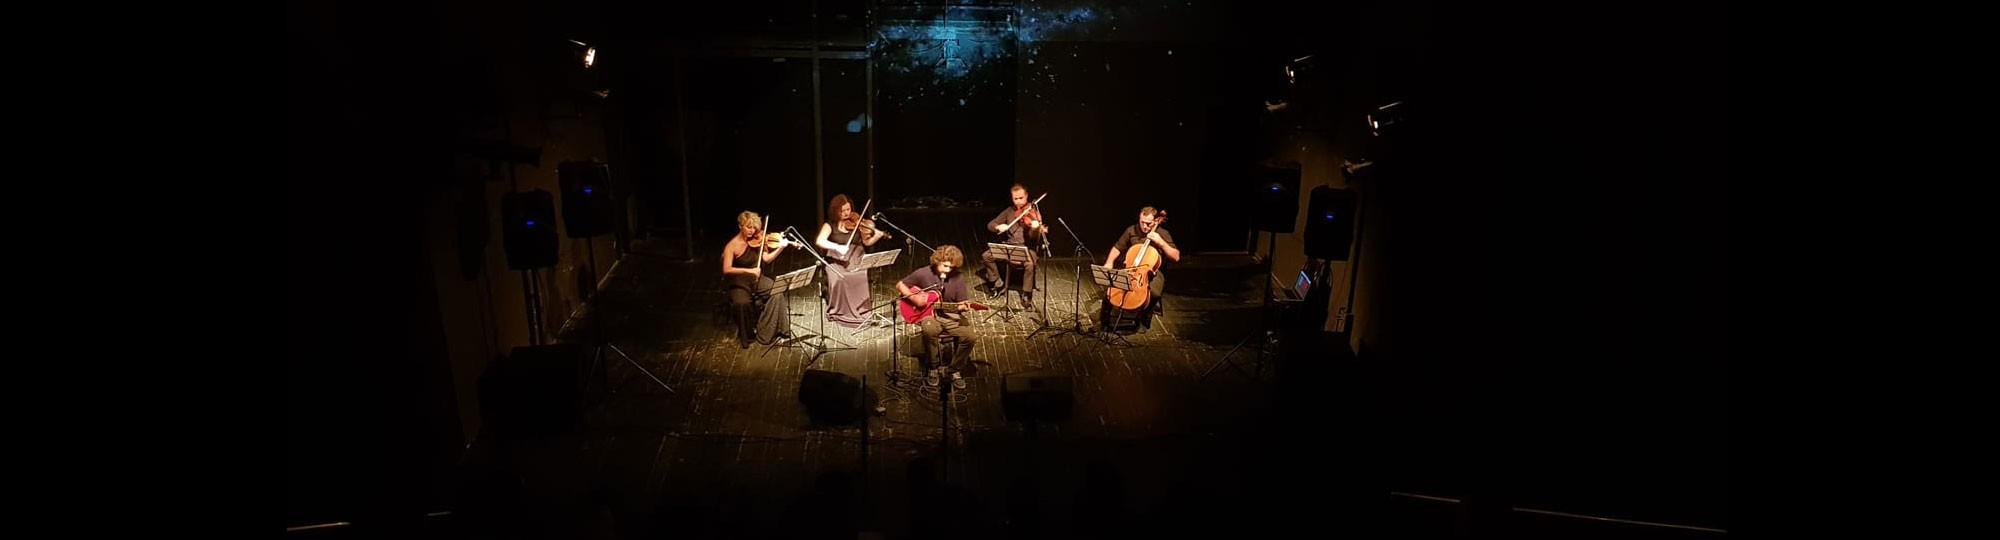 360 VR - KID JESUS & String Quartet